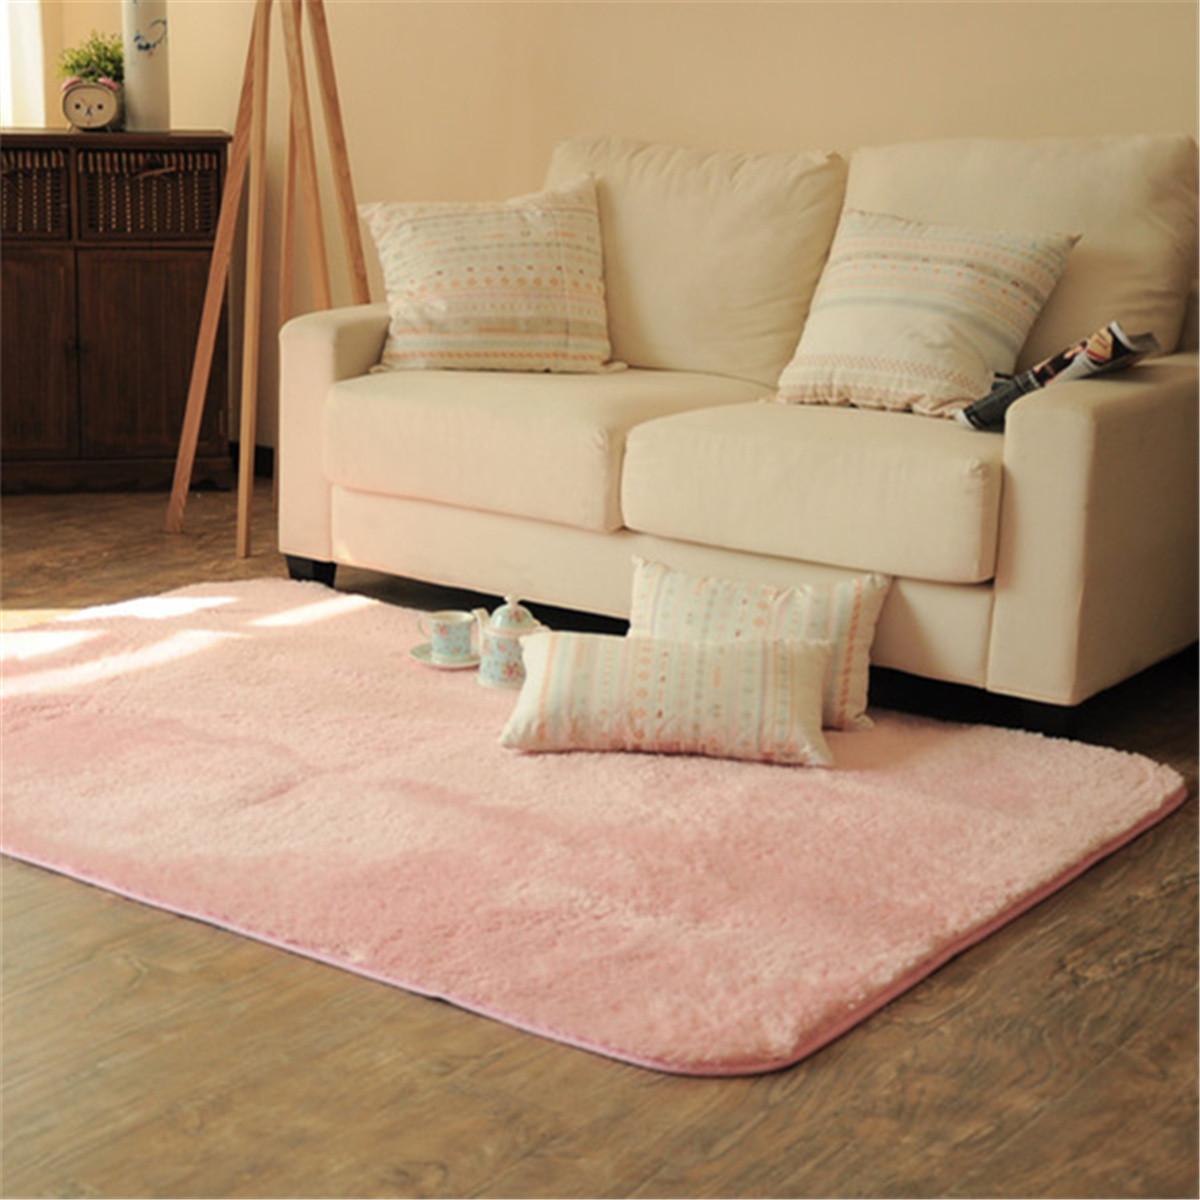 New Modern Designer Shag Shaggy Area Rug Living Room Carpet Bedroom Rug 3x5 ft